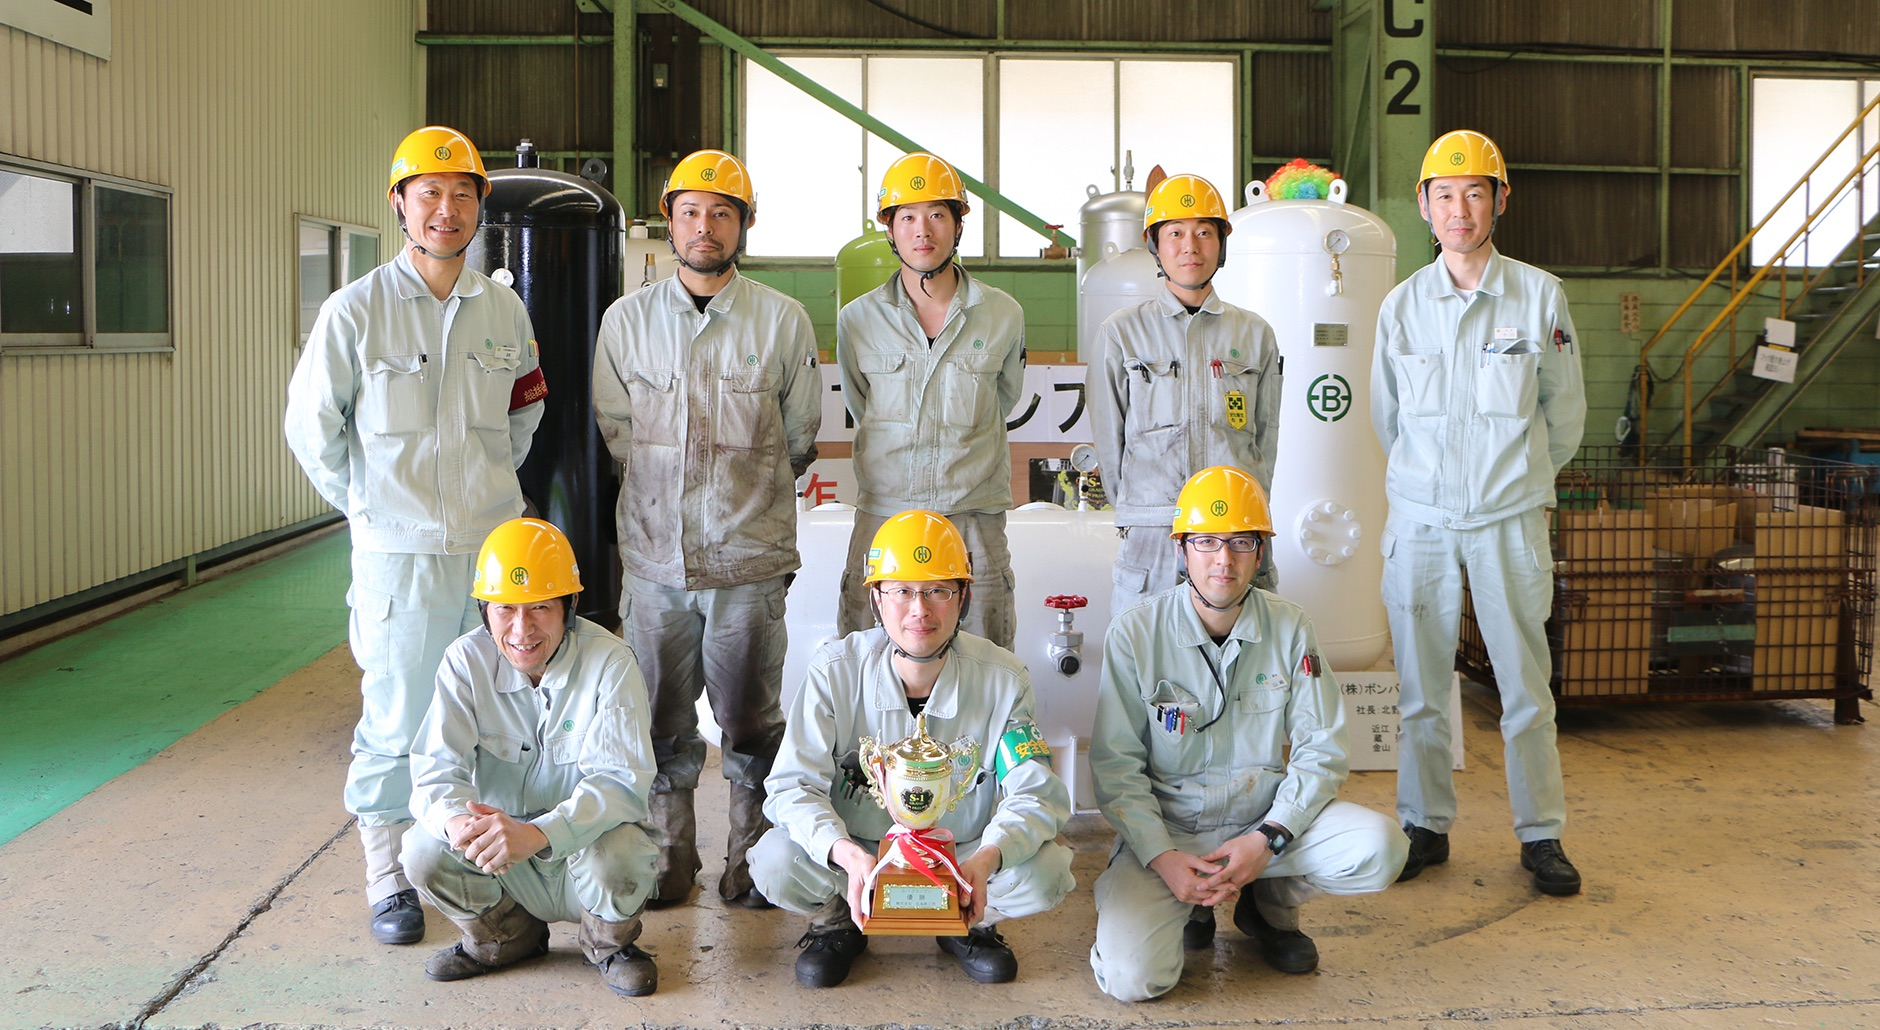 座談会後のチーム代表6名と林社長(後列左端)、十川主任(後列右端)